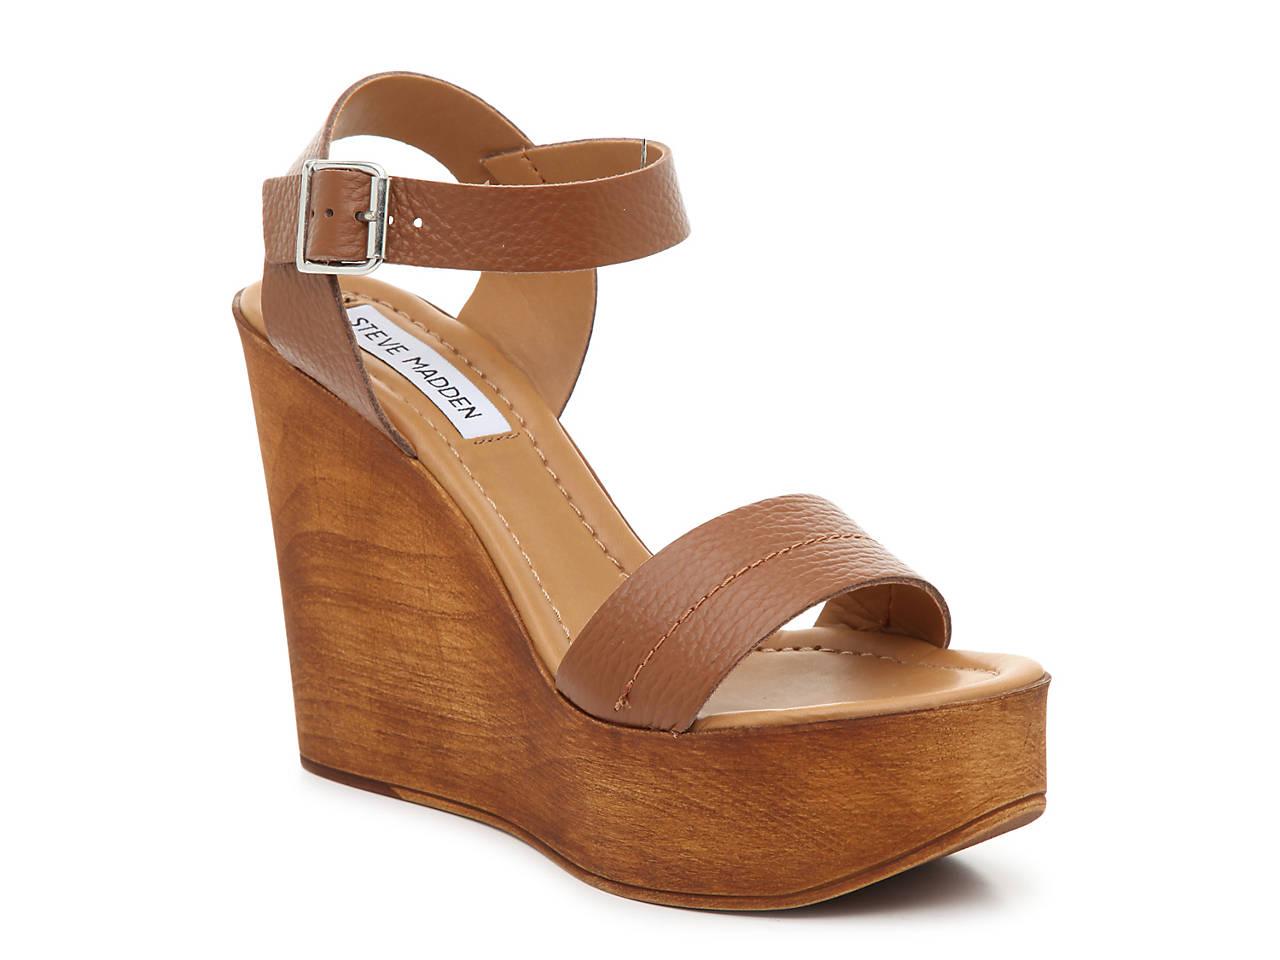 2afbffa44ad Steve Madden Belma Wedge Sandal Women s Shoes